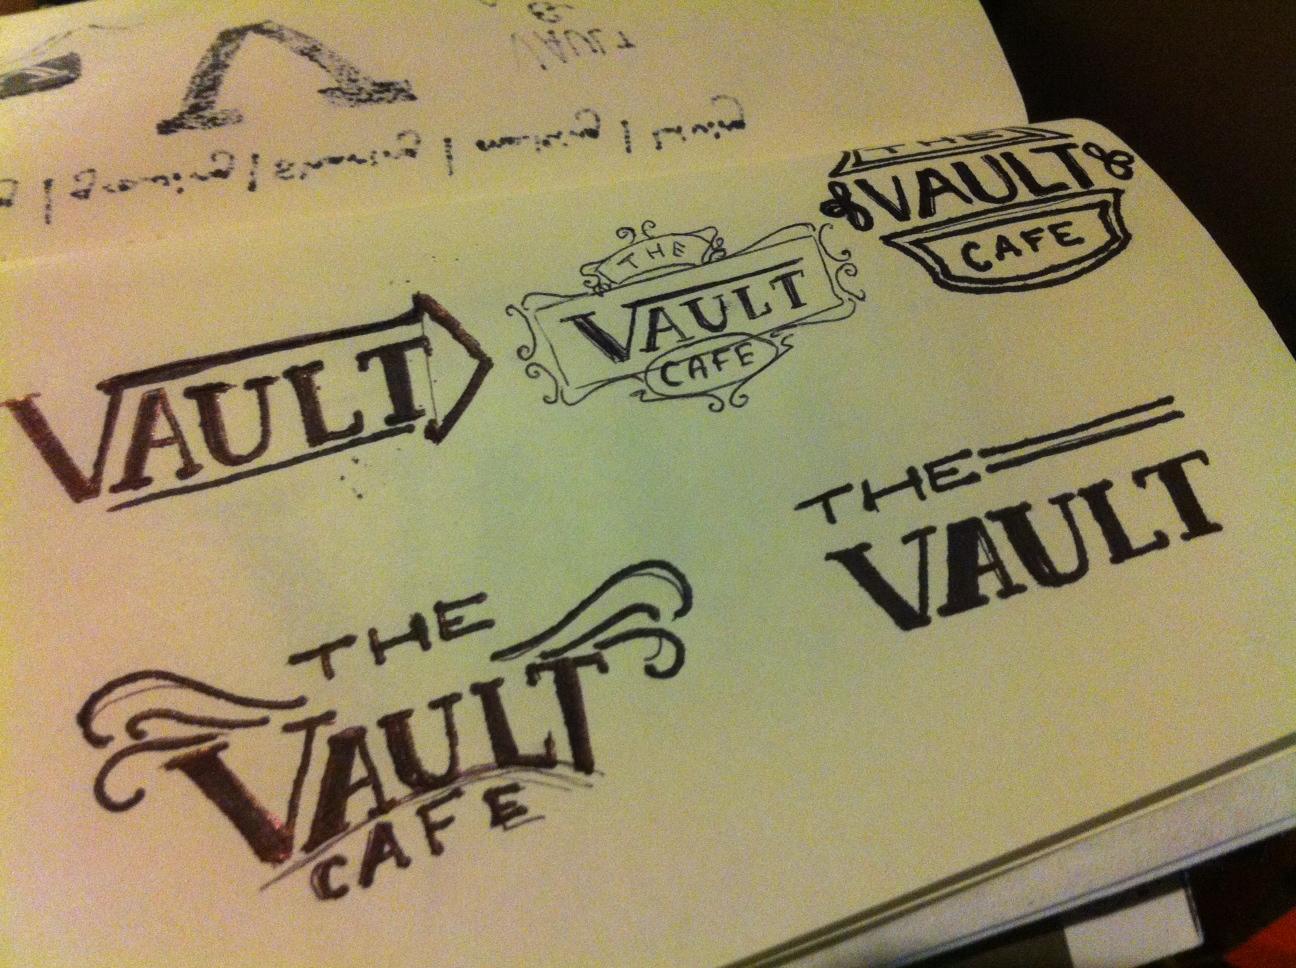 The Vault Cafe - Label Design - image 4 - student project